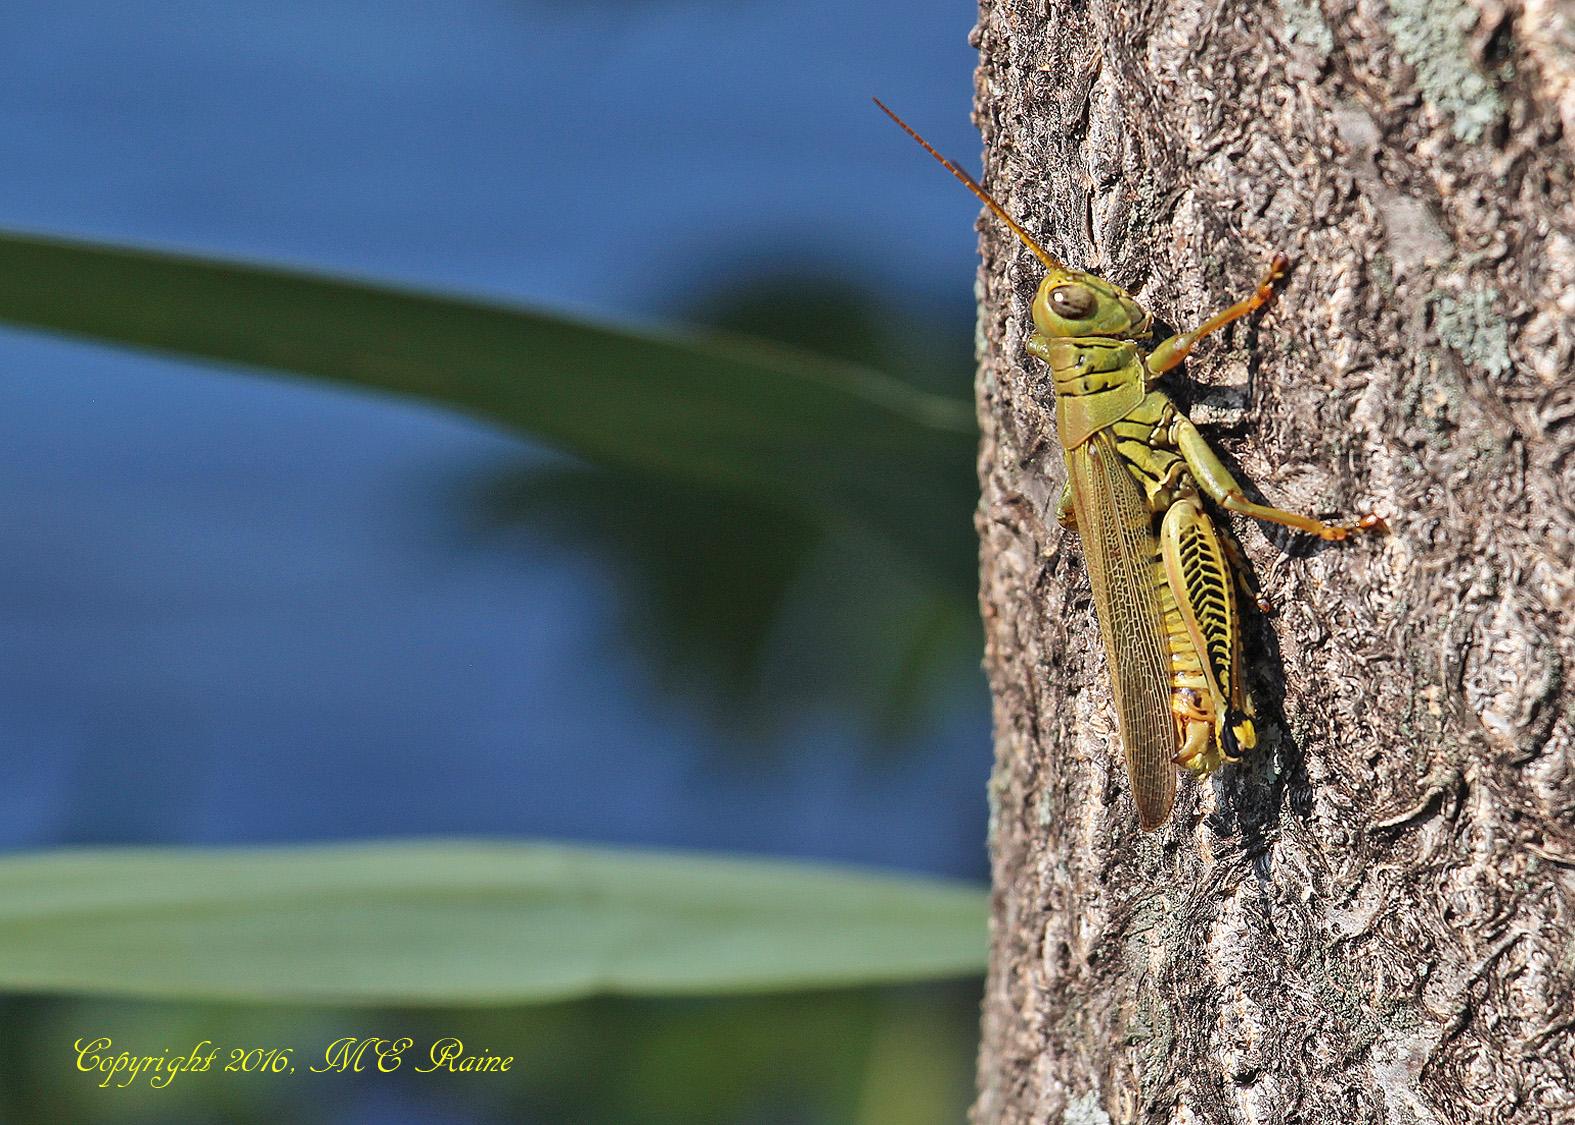 grasshopper-dekorte-mickey-9-4-16